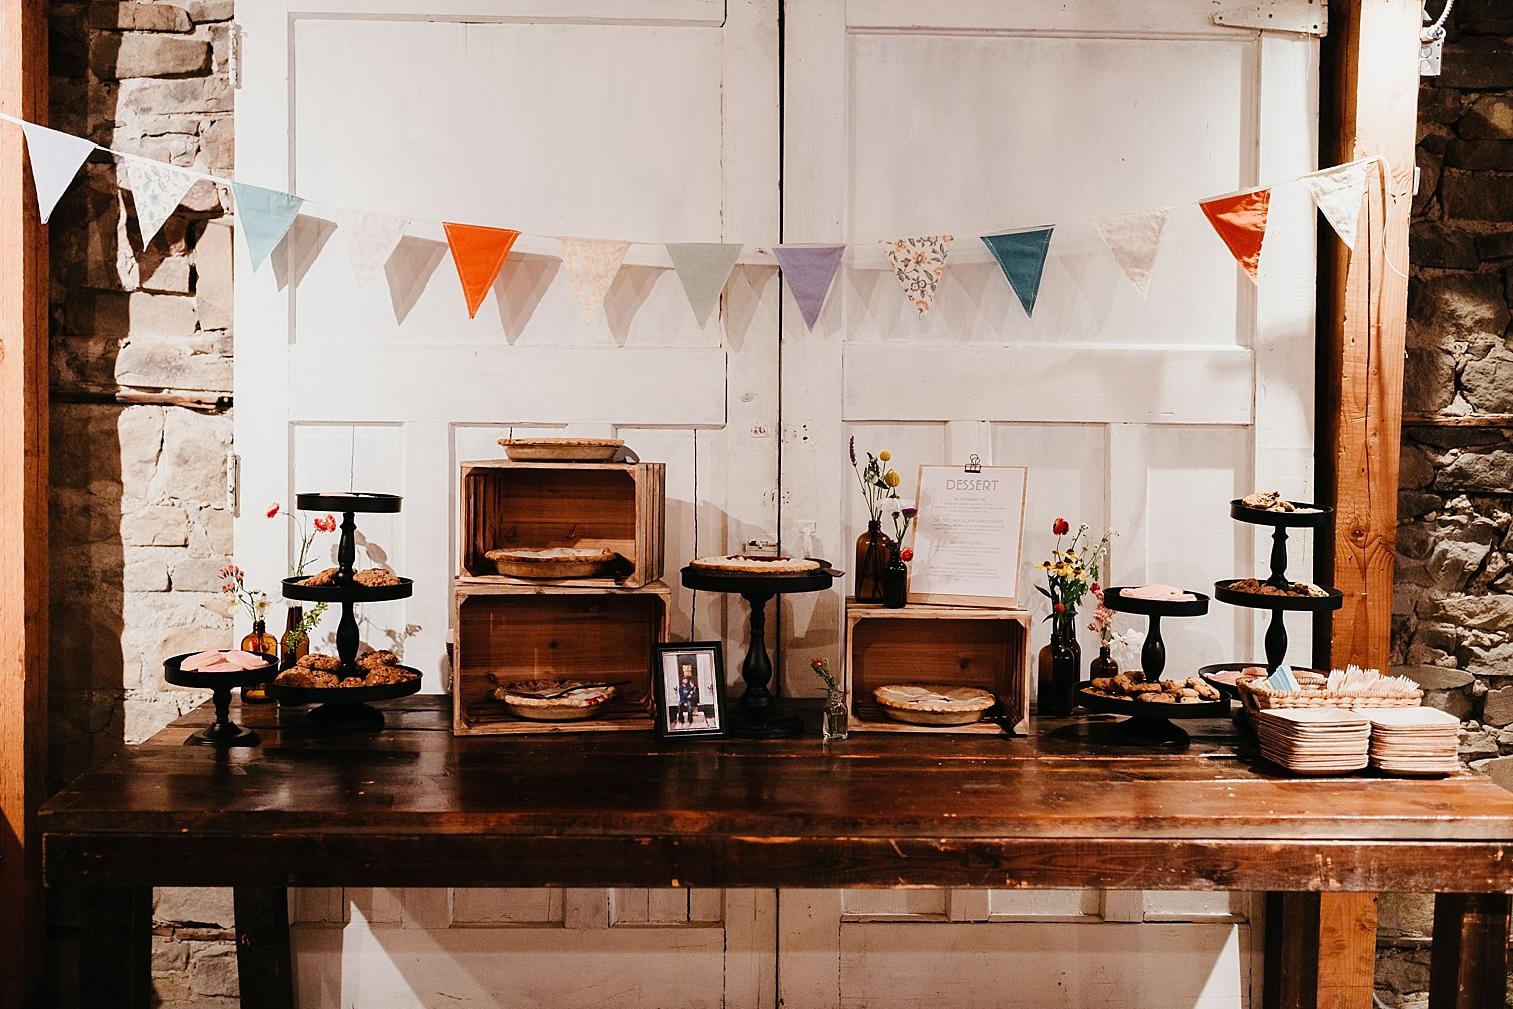 Summer-Camp-Themed-Wedding-119.jpg